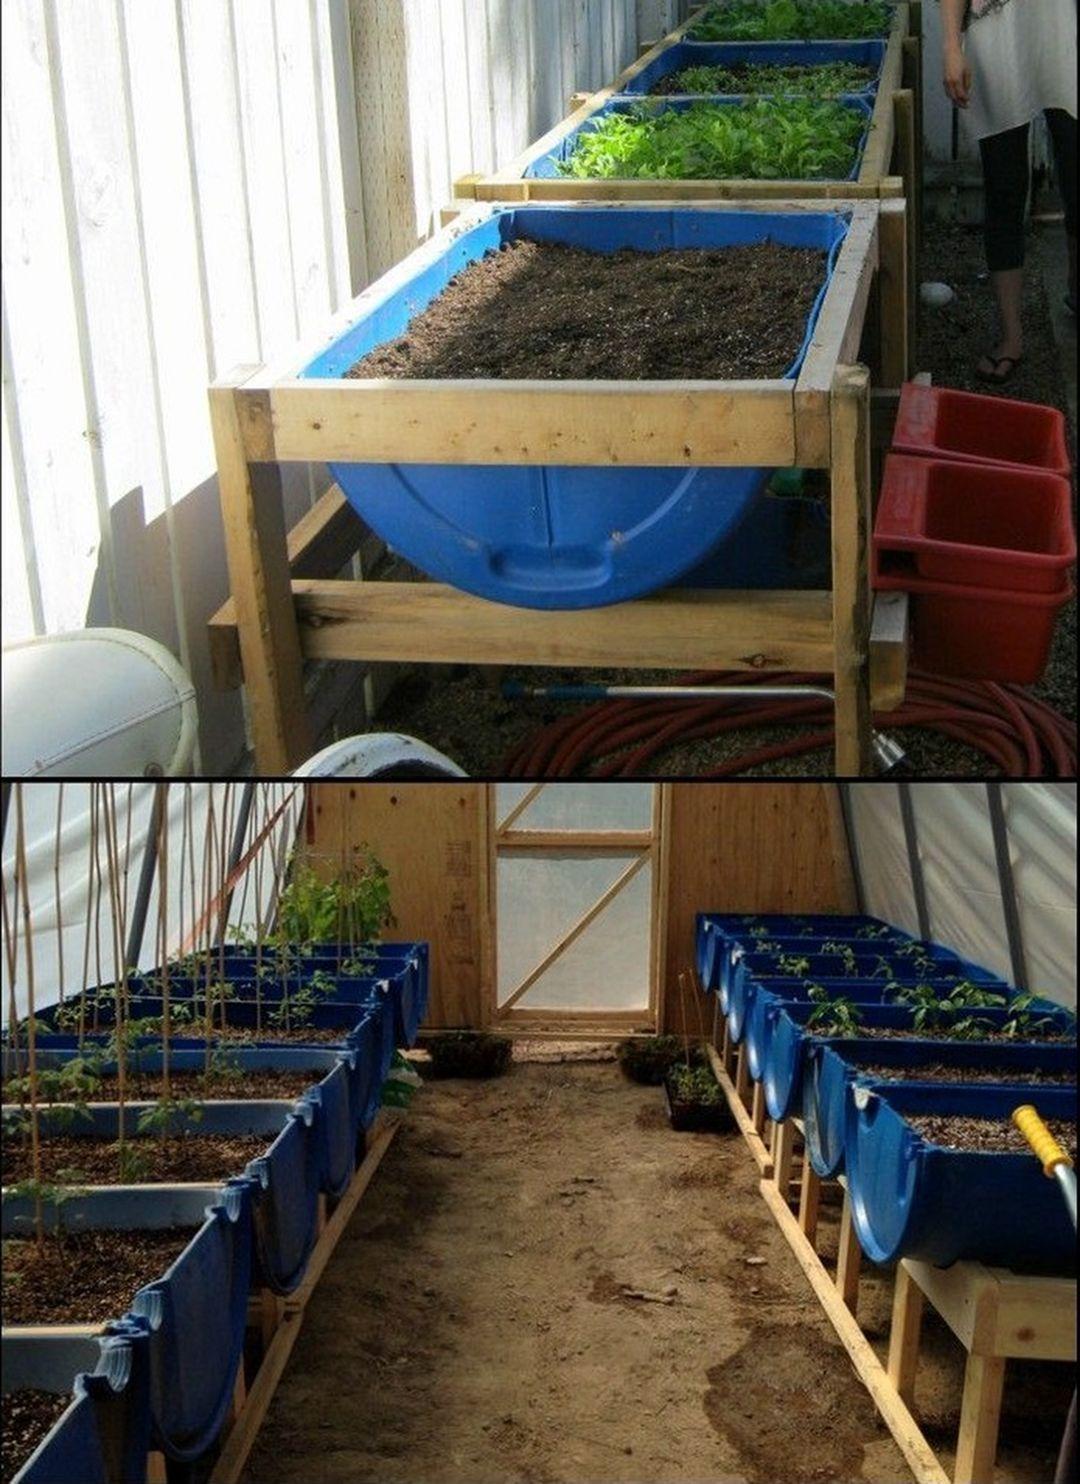 Easy Diy Wooden Raised Planter 50 Avec Images Deco Jardin Palettes Amenagement Jardin Idees Jardin